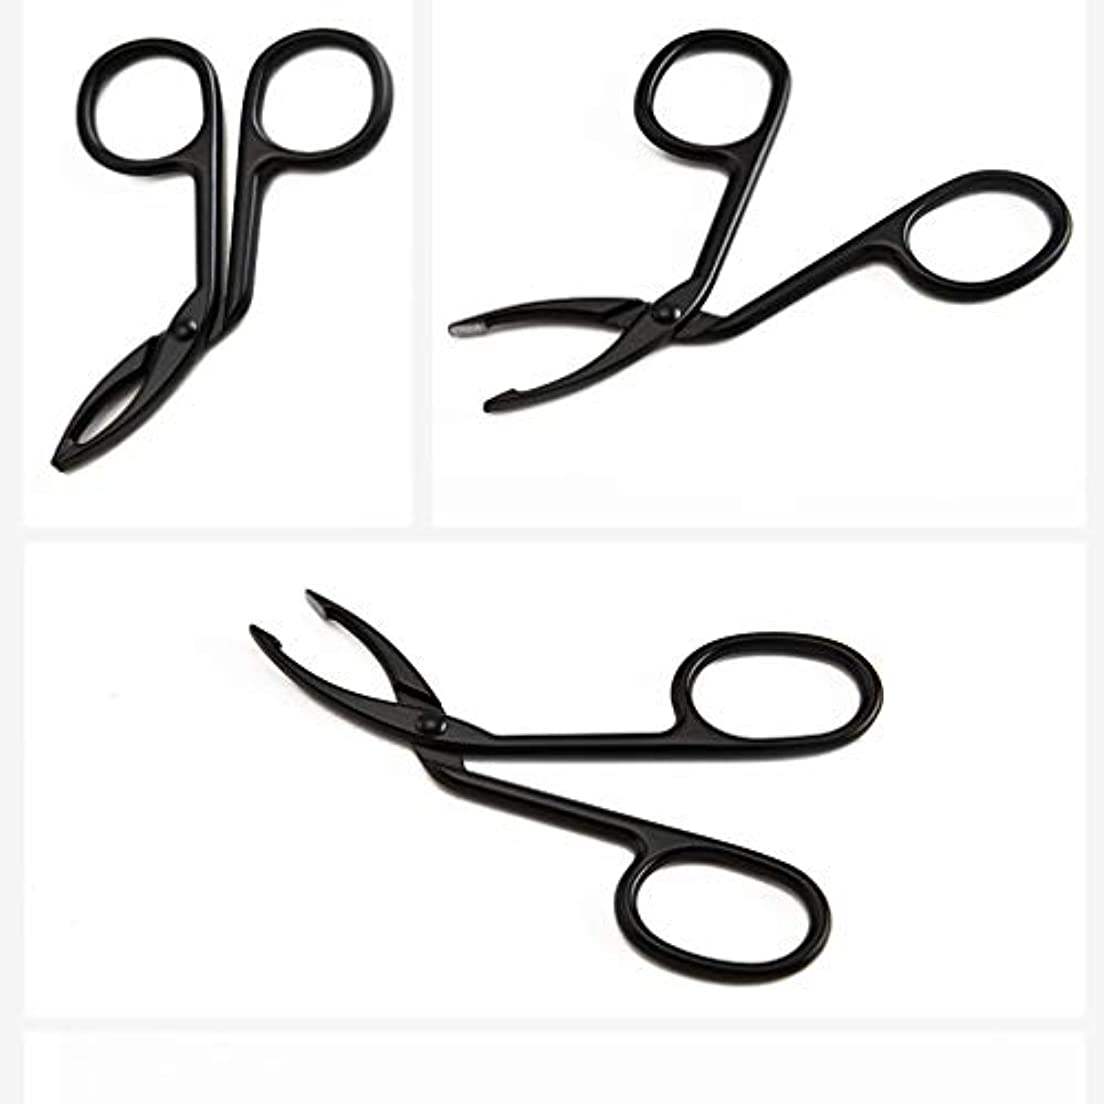 LUXWELL(ラクスウェル)眉毛ピンセットアイブロウ ピンセットクリップ 毛抜き まゆ毛ピンセット 人気の 化粧工具 クリップ